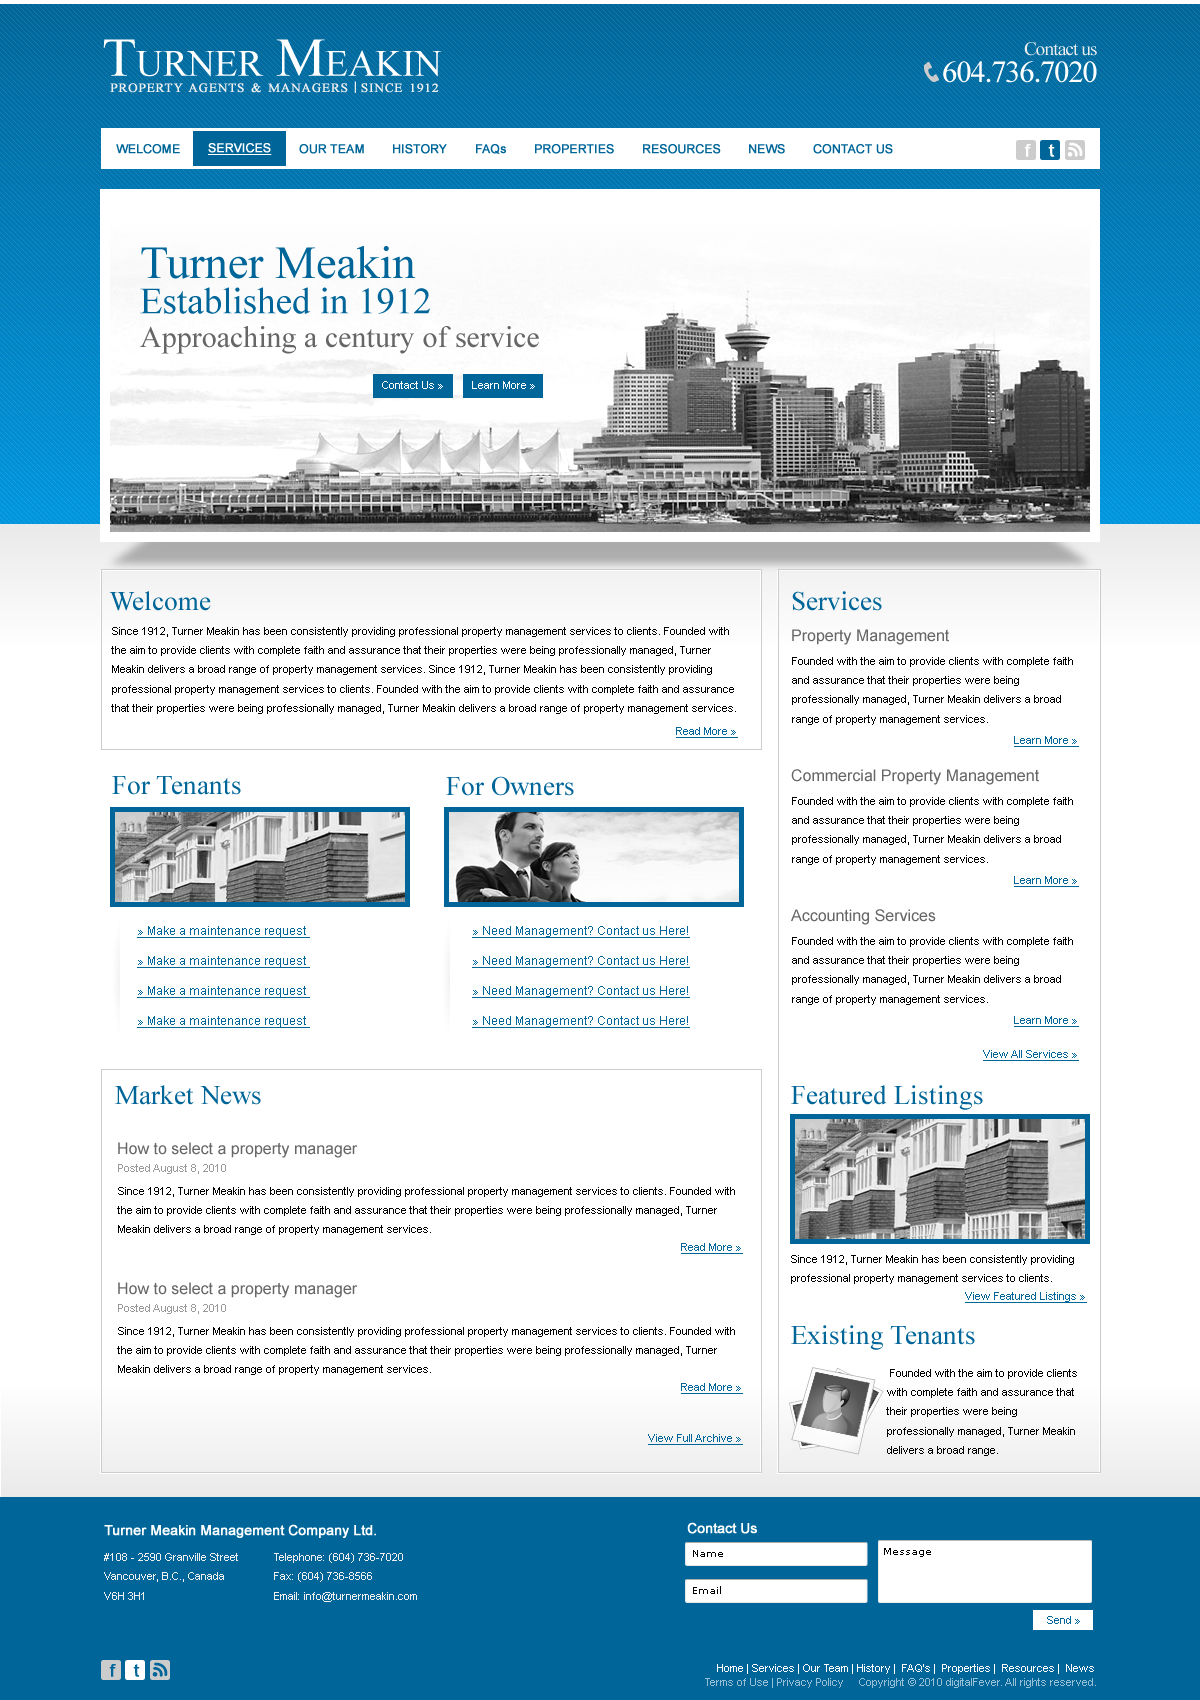 Turner Meakin Web Design by dFEVER